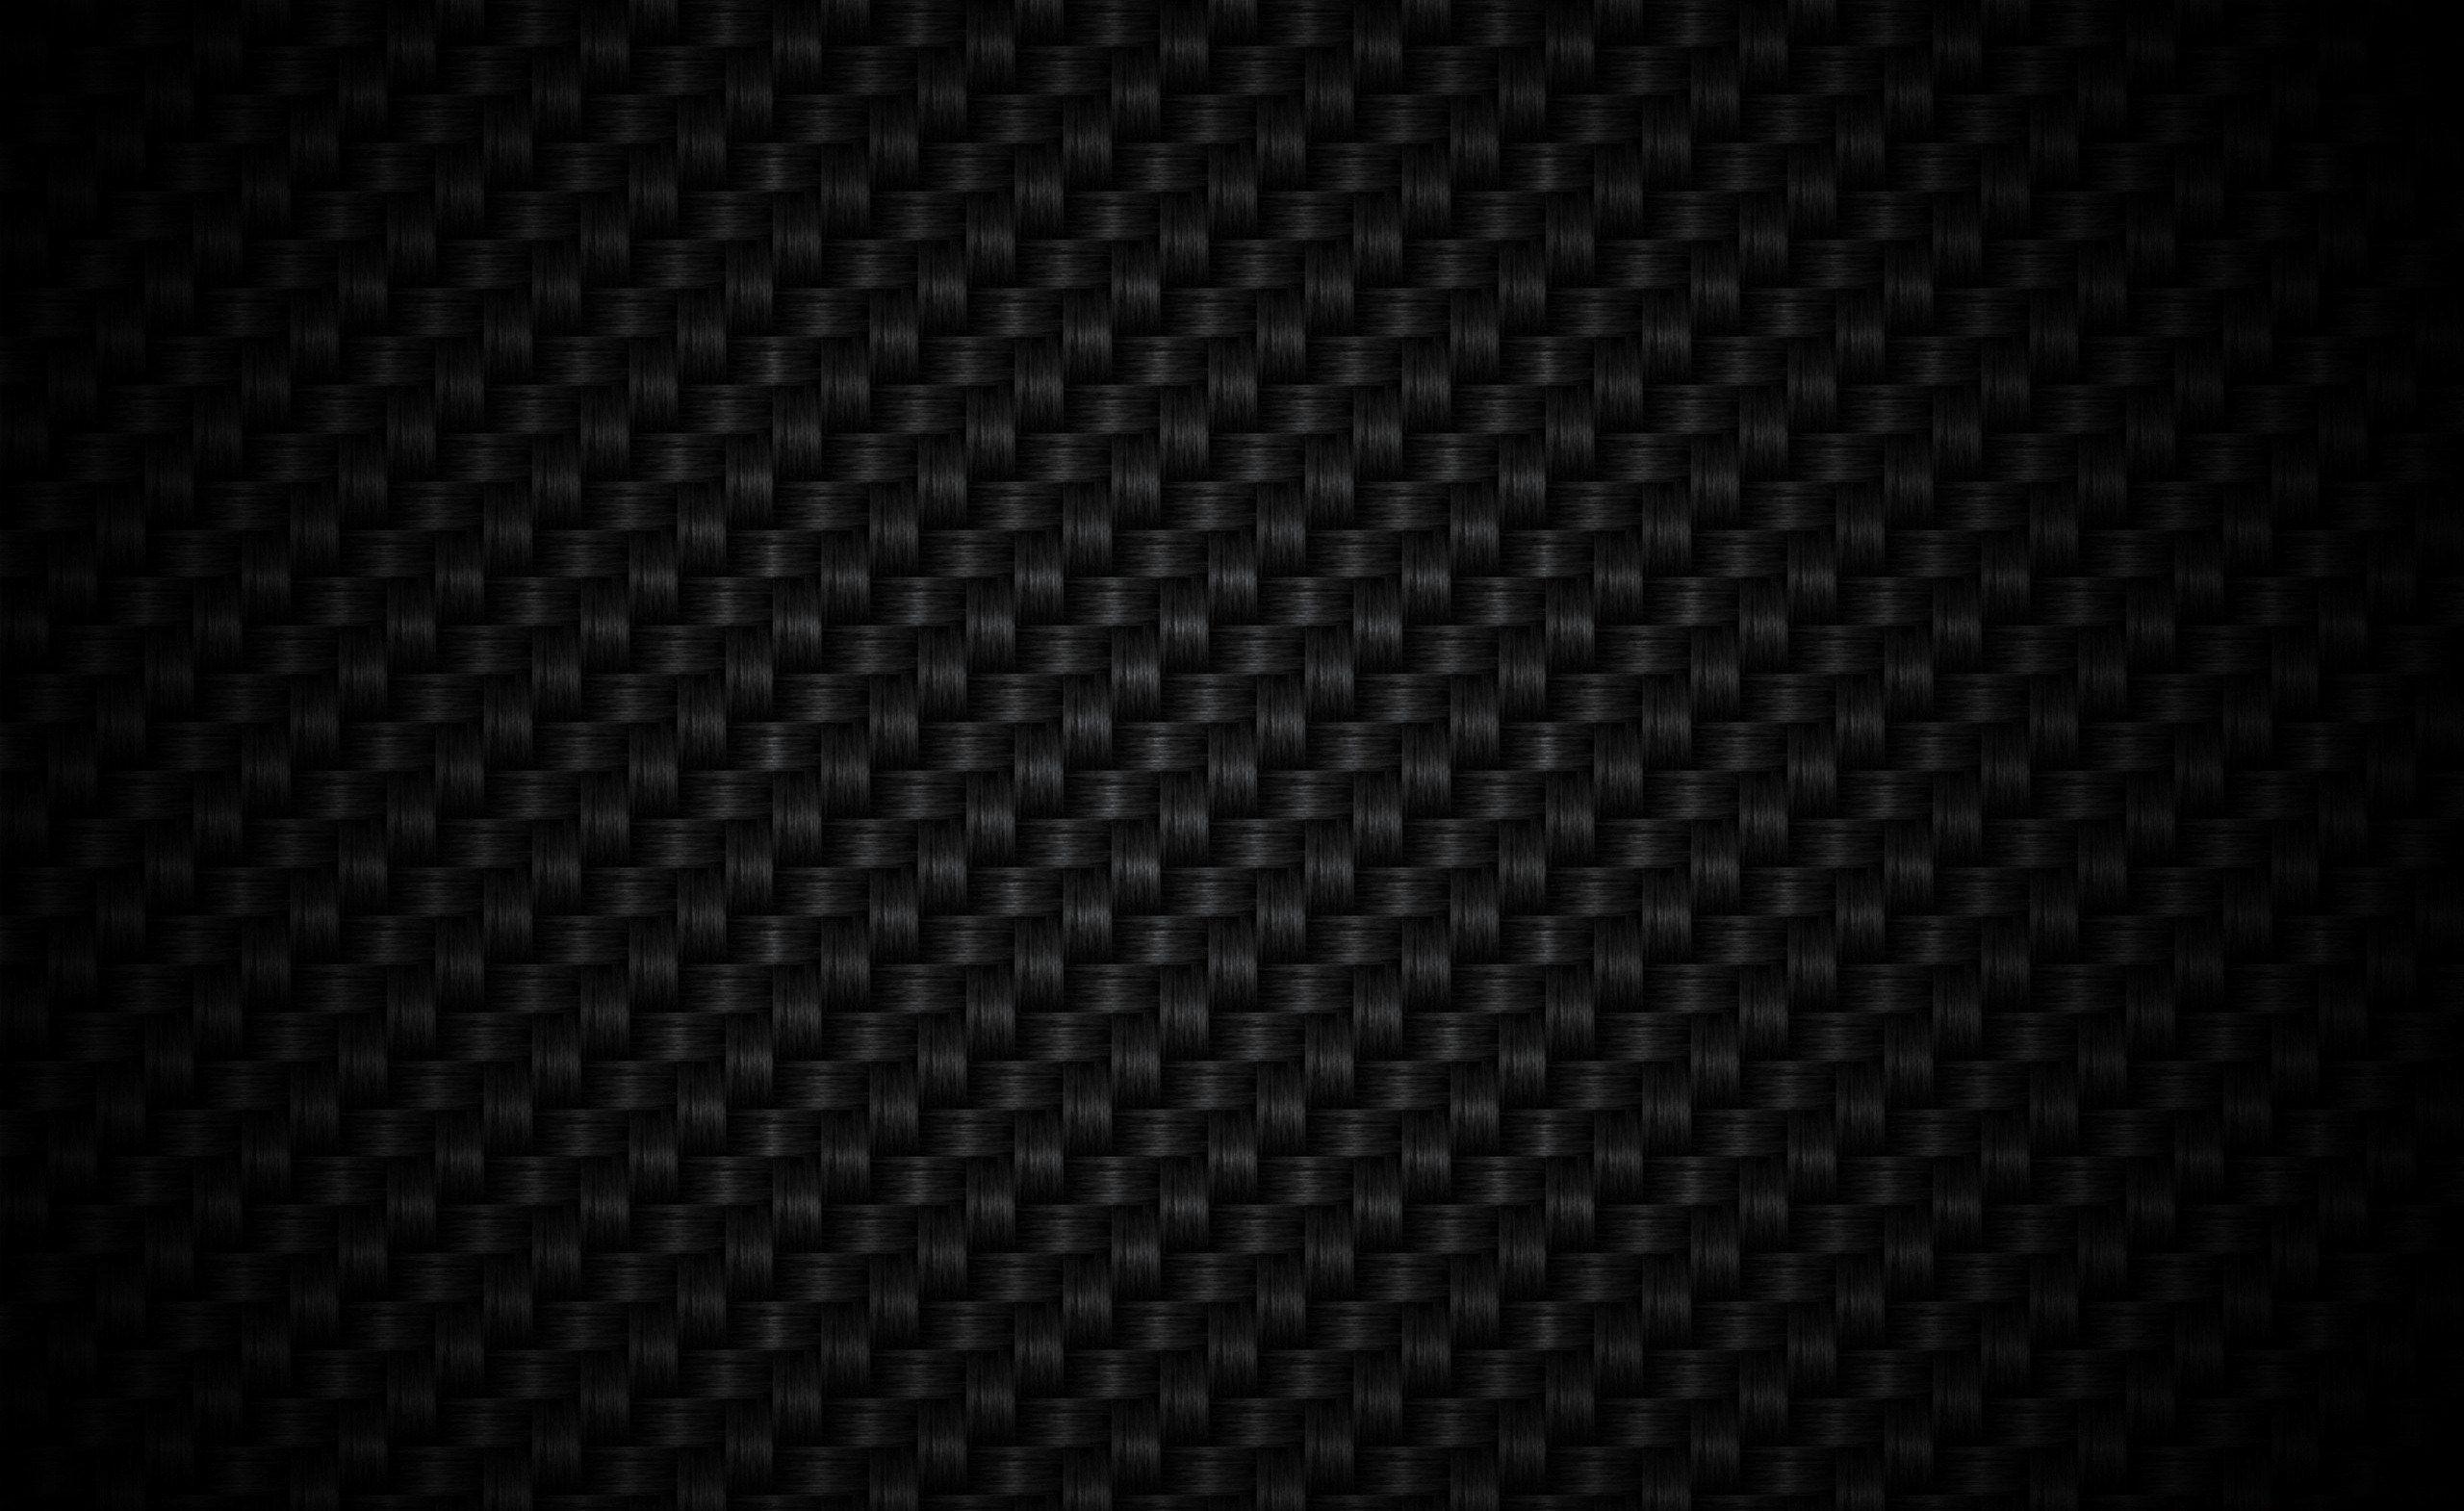 Unduh 100+ Wallpaper Black Full Hd